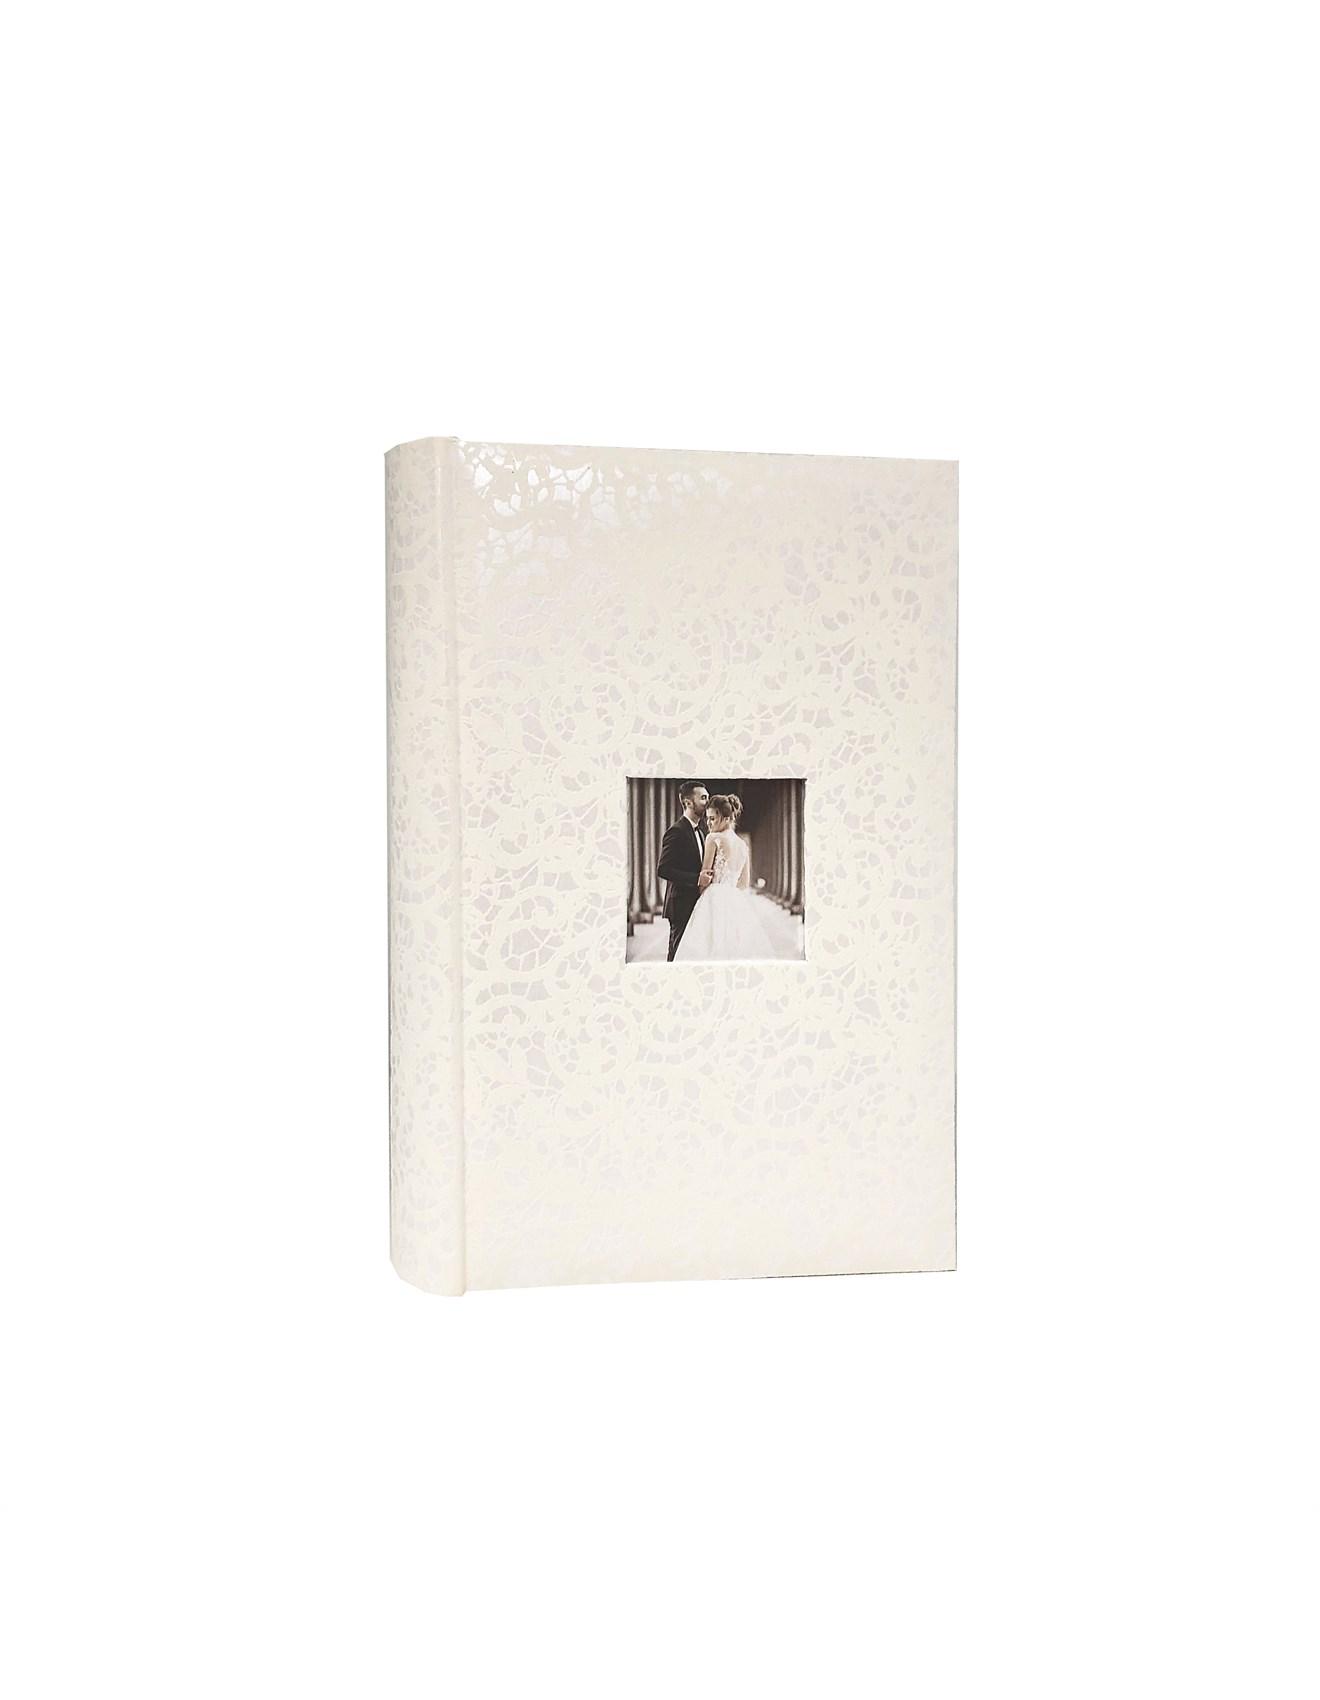 Lace Wedding Album 300pht 4x6